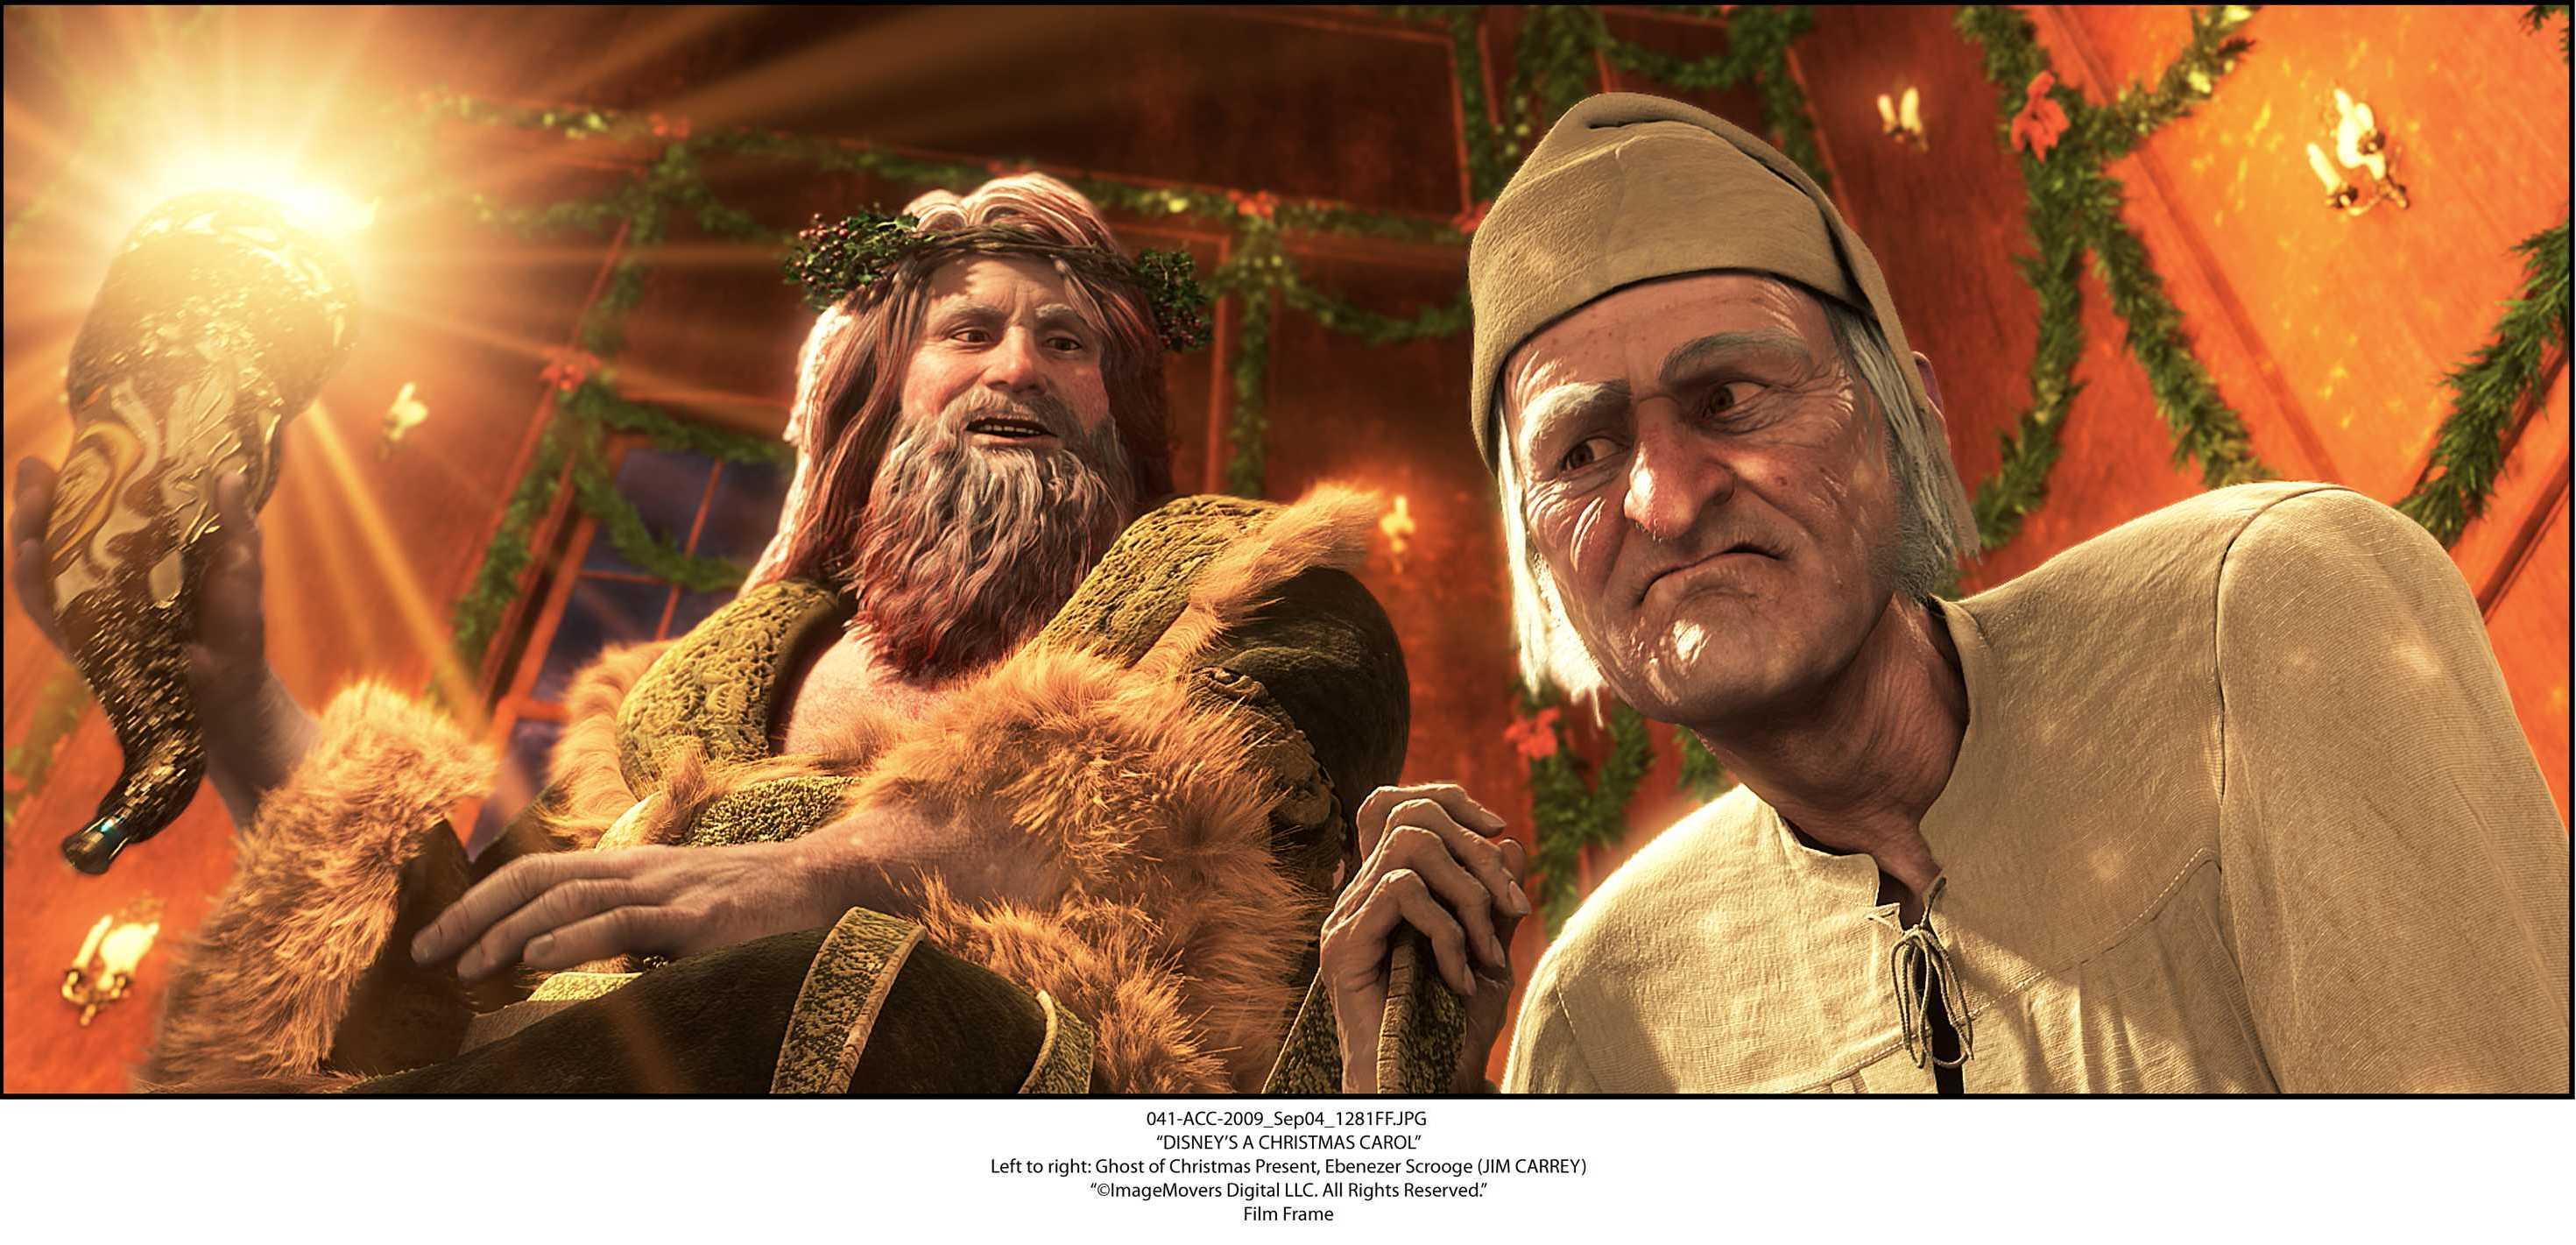 A Christmas Carol 2009 Cast.Disney S A Christmas Carol Video Game 2009 Photo Gallery